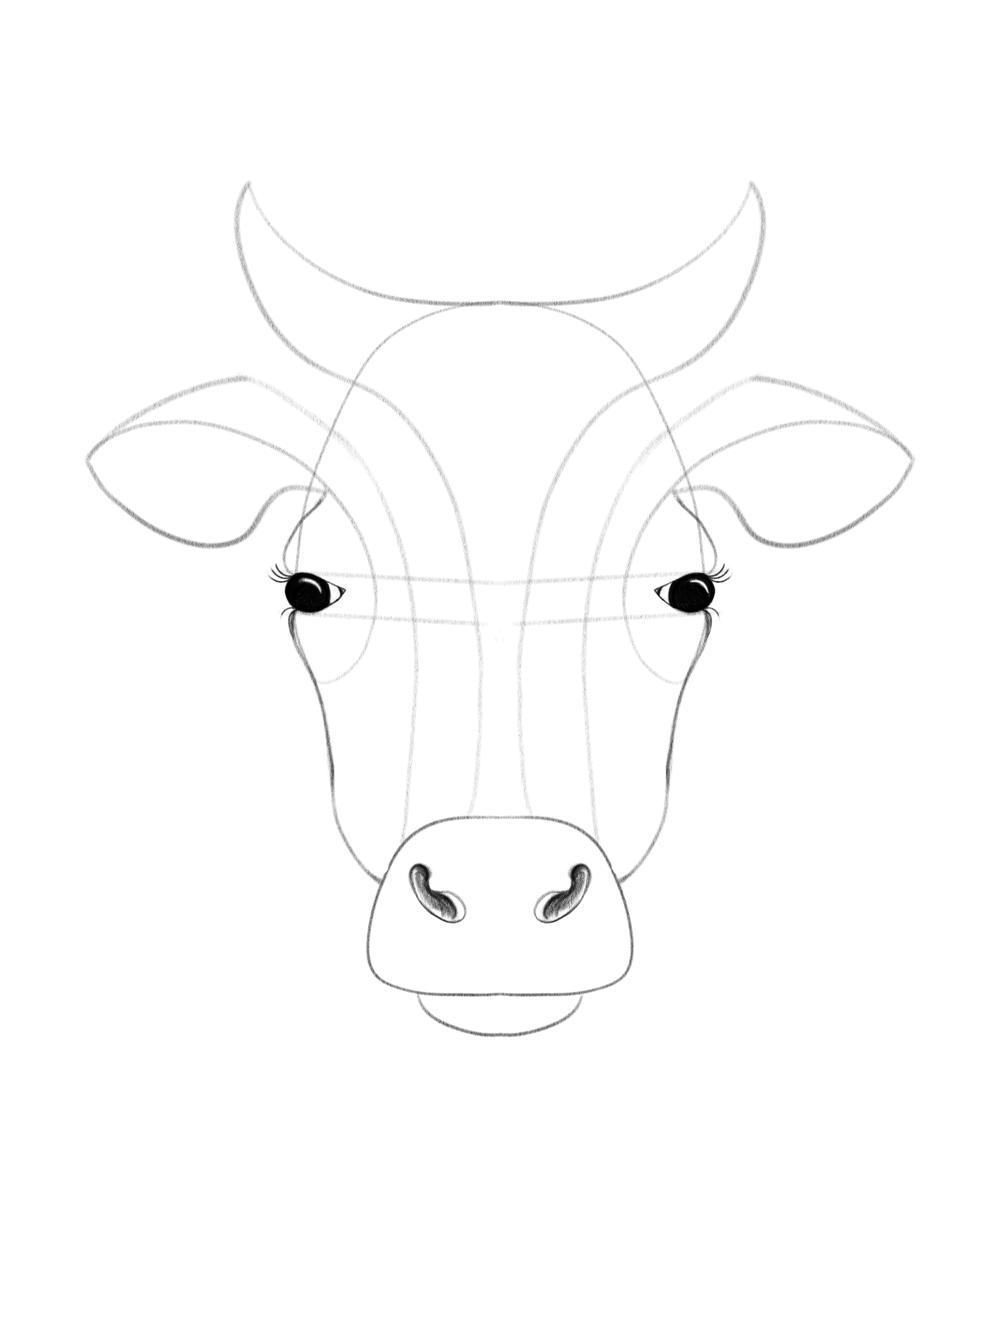 Geometric Illustration: Animal Face - image 4 - student project